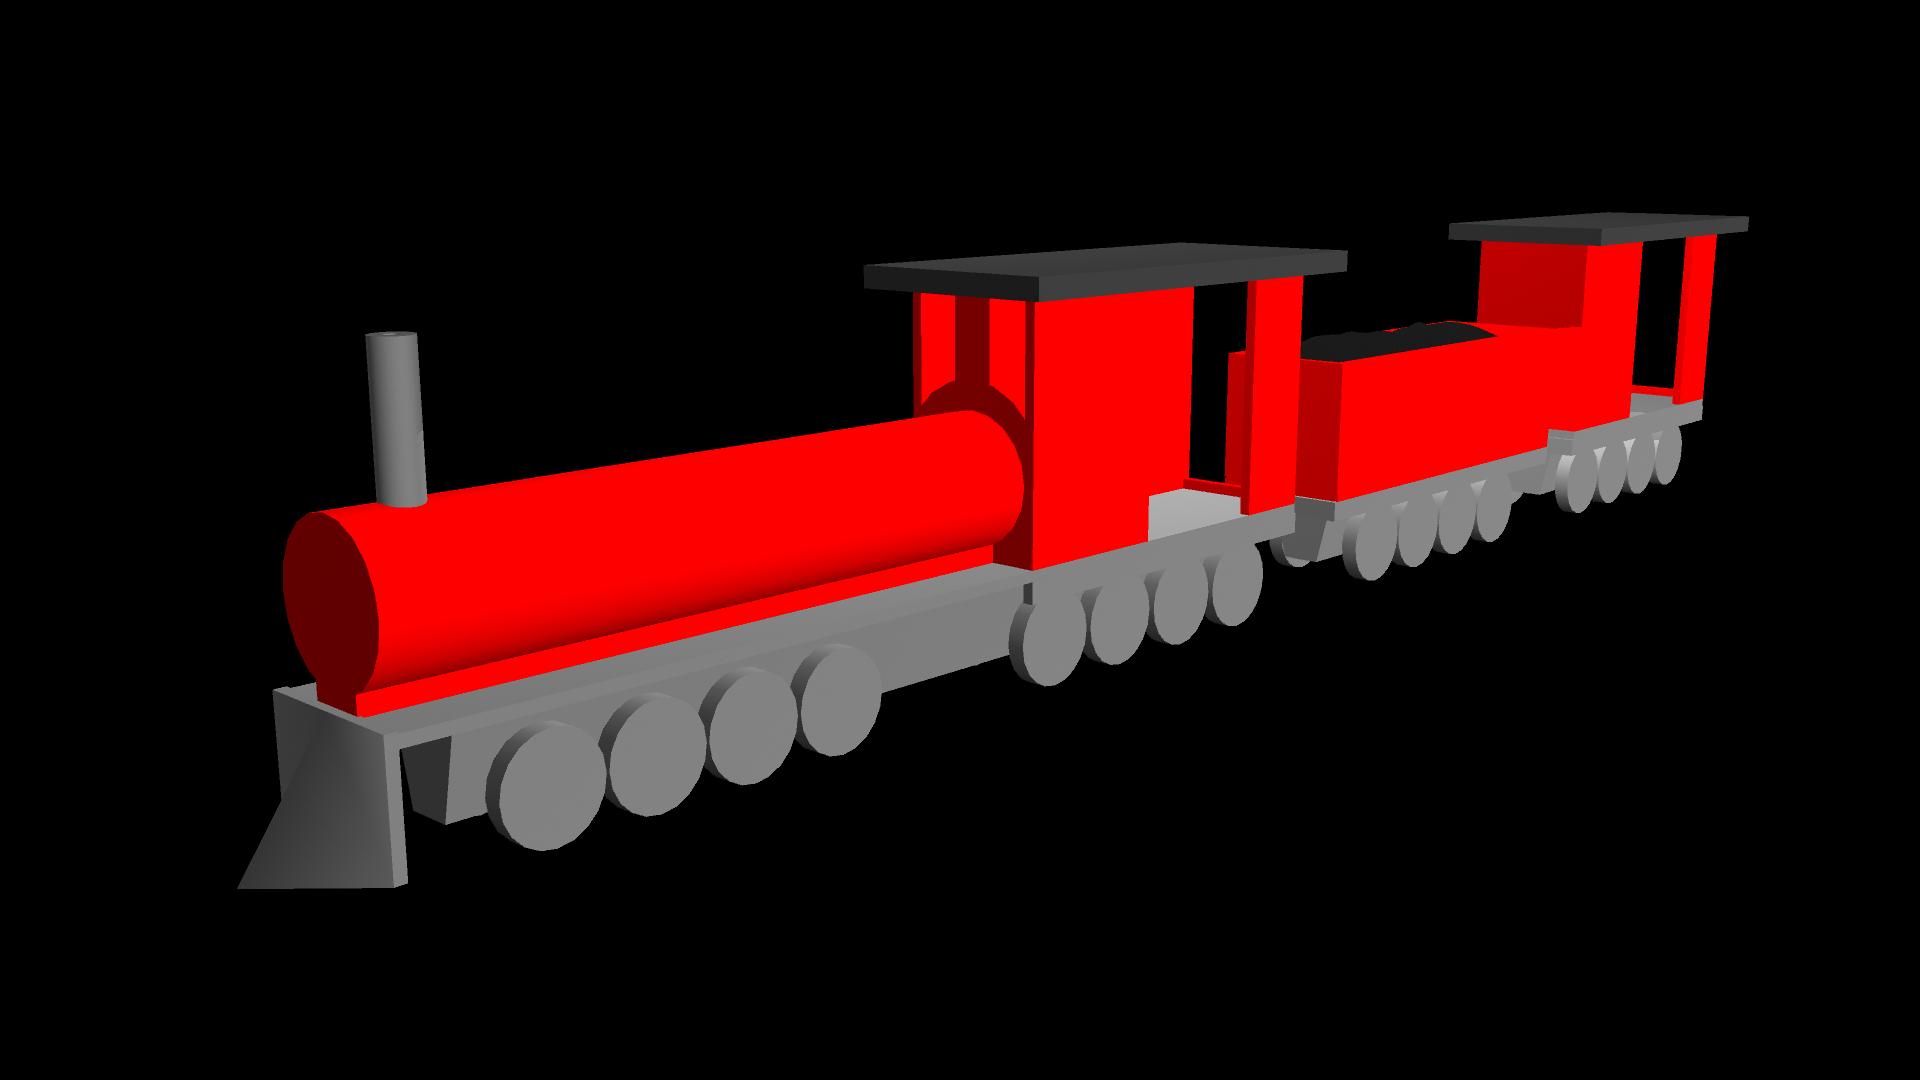 Task d modelling maya. Clipart train toy train